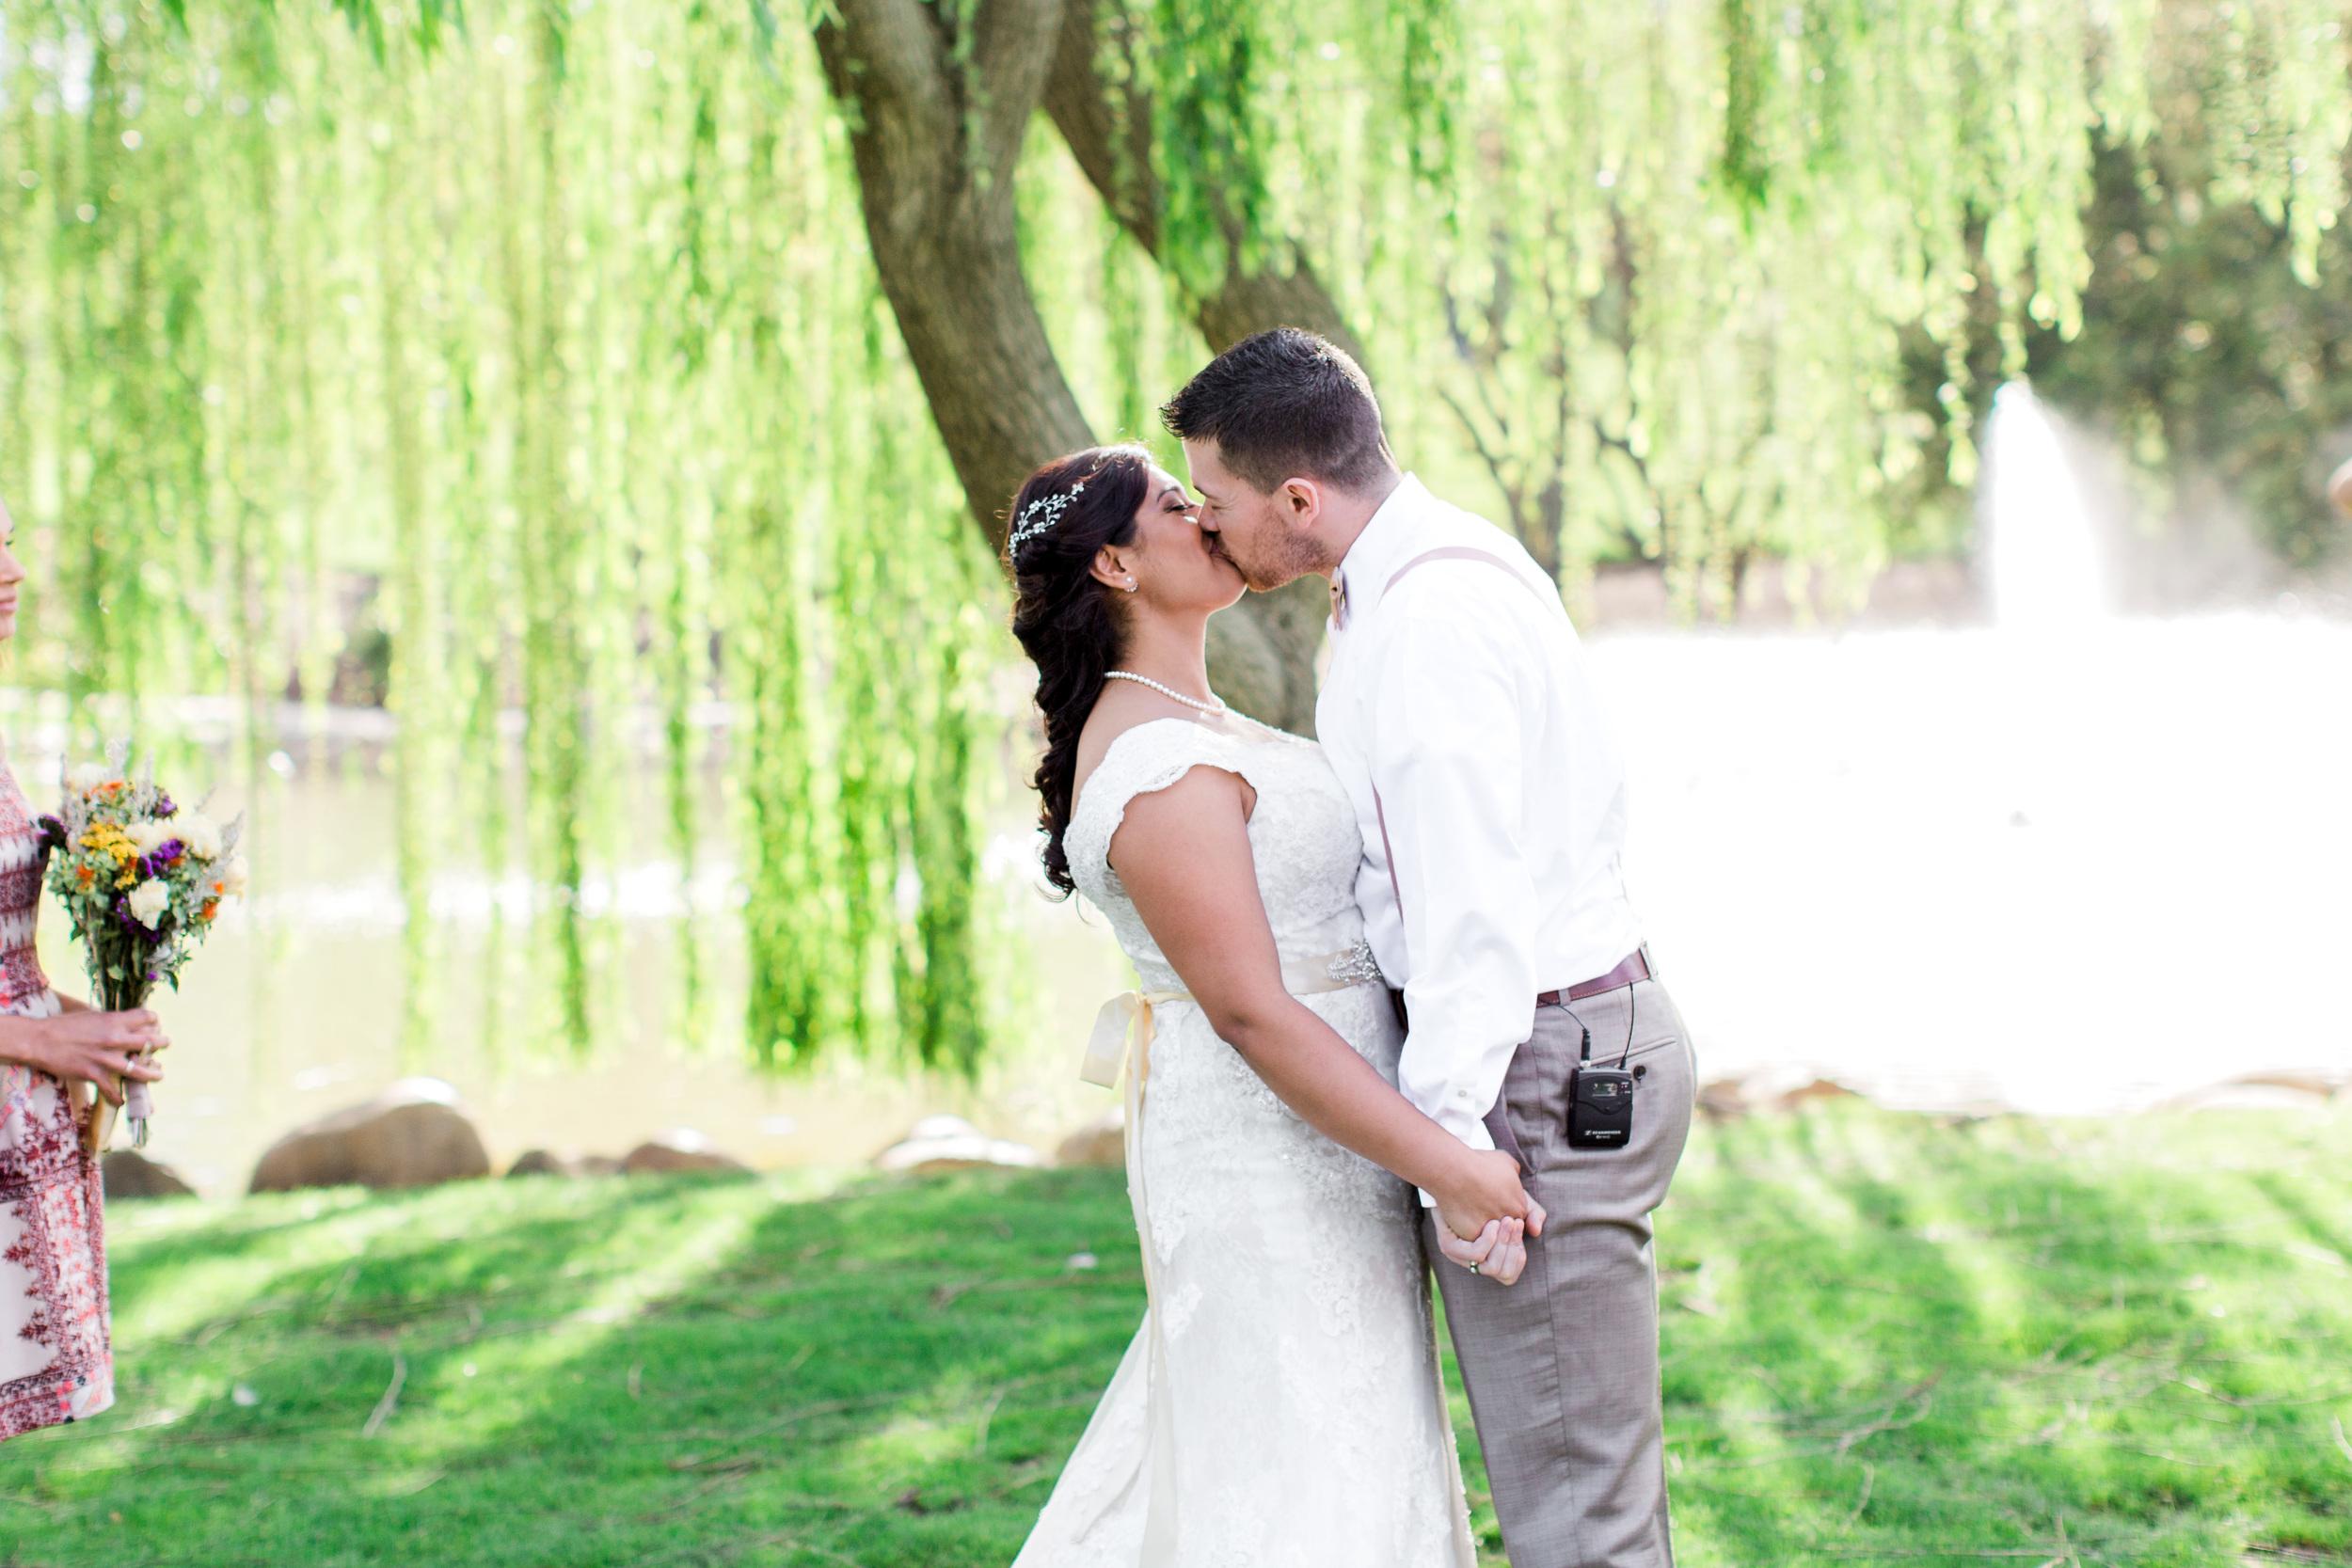 oak-hill-park-danville-california-wedding-photography